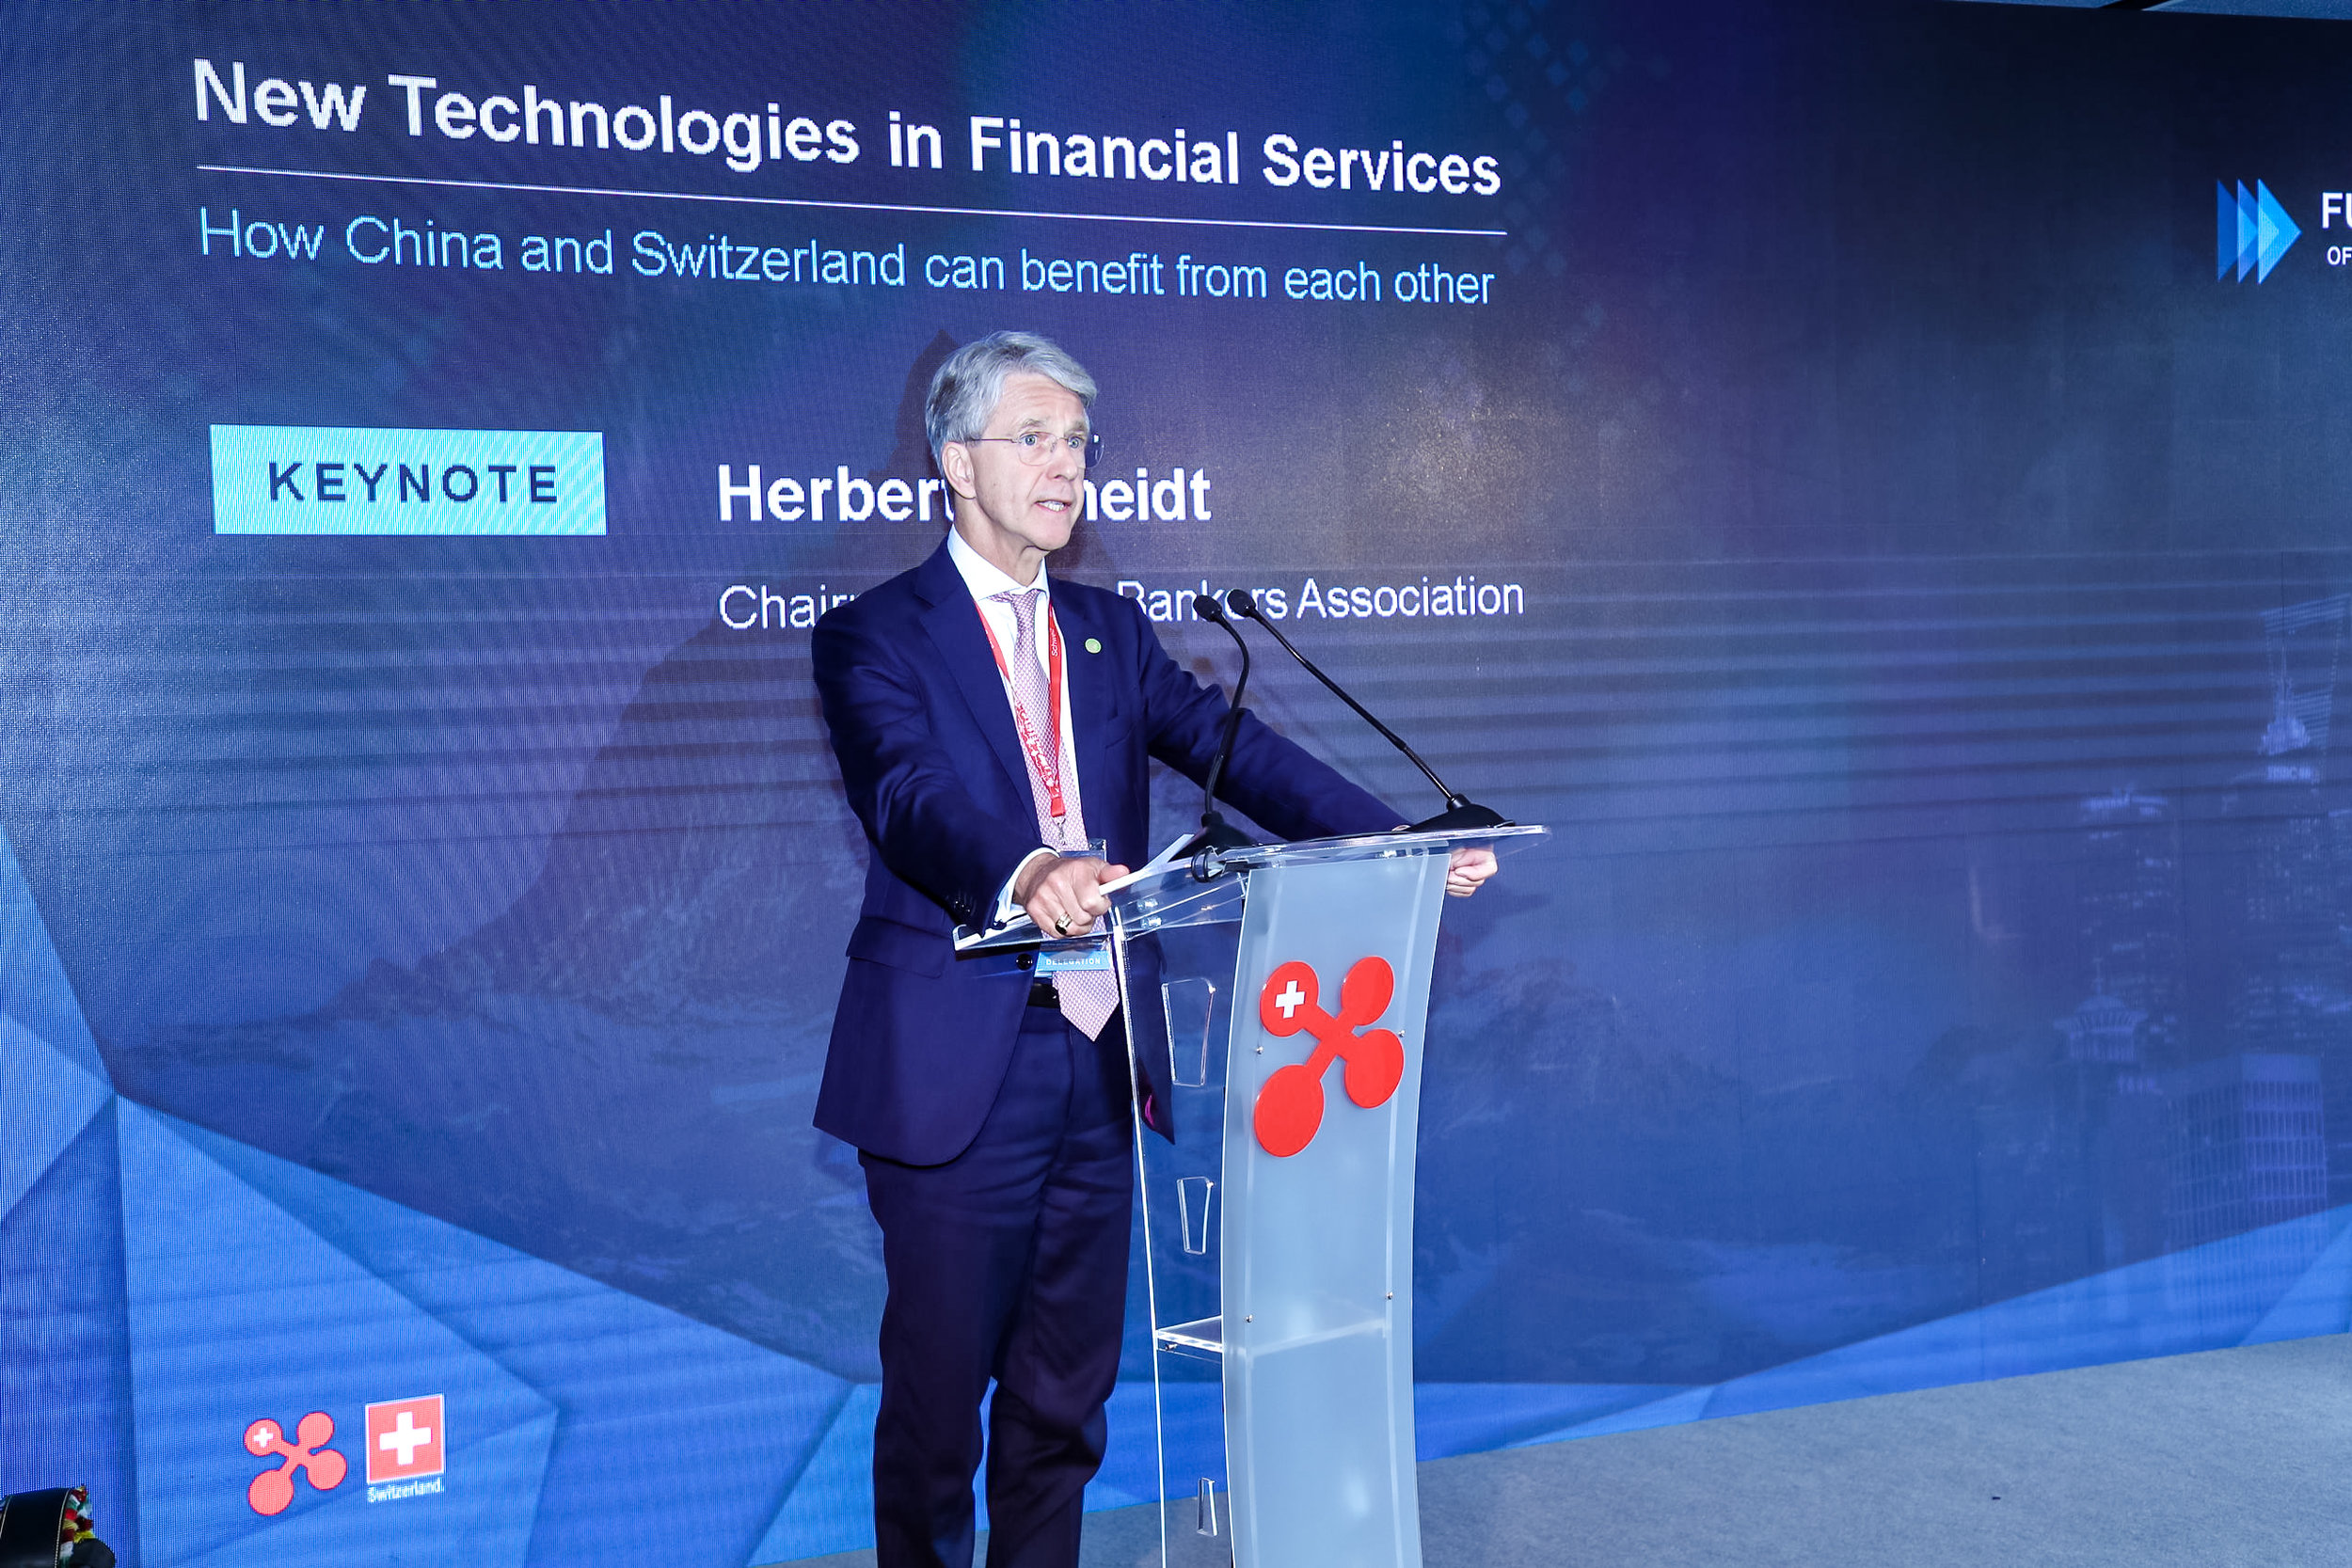 Mr Herbert J. Scheidt, Chairman of the Swiss Bankers Association (SBA) delivers a keynote speech.